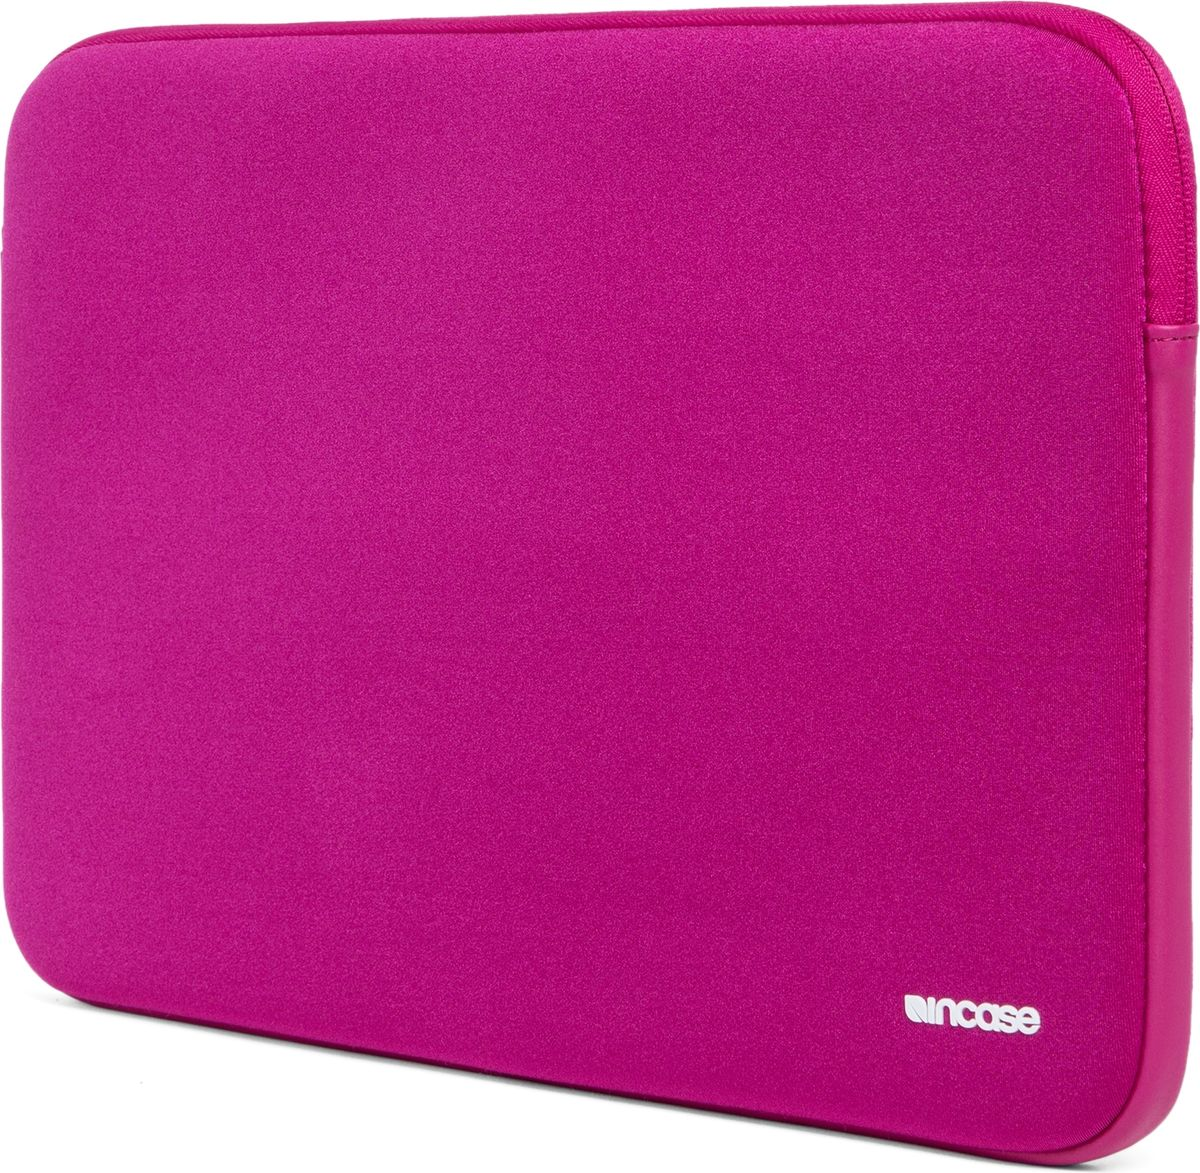 все цены на  Incase Neoprene Classic Sleeve чехол для Apple MacBook 15